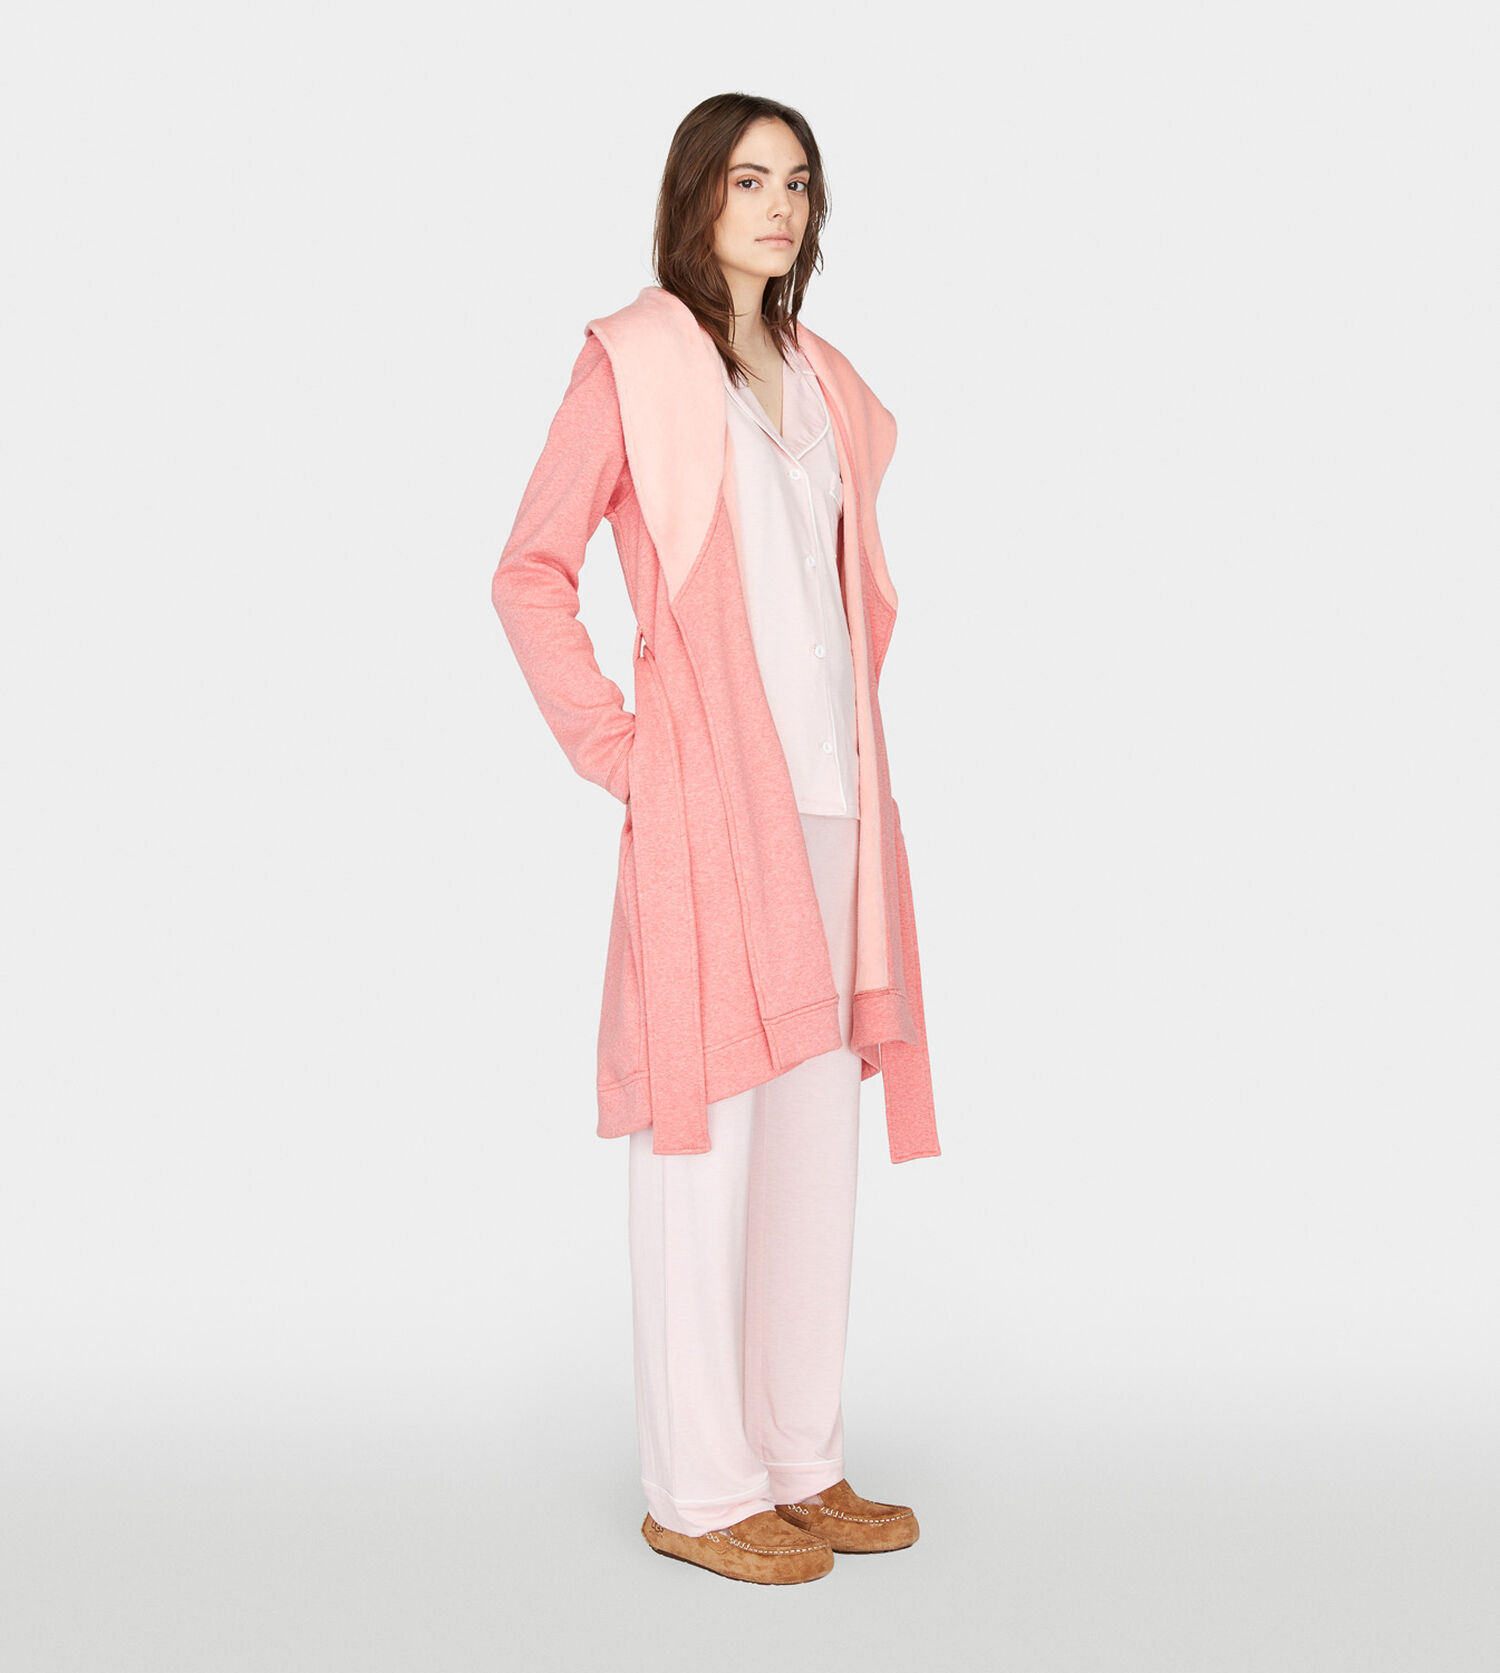 ugg official women 39 s blanche robes. Black Bedroom Furniture Sets. Home Design Ideas